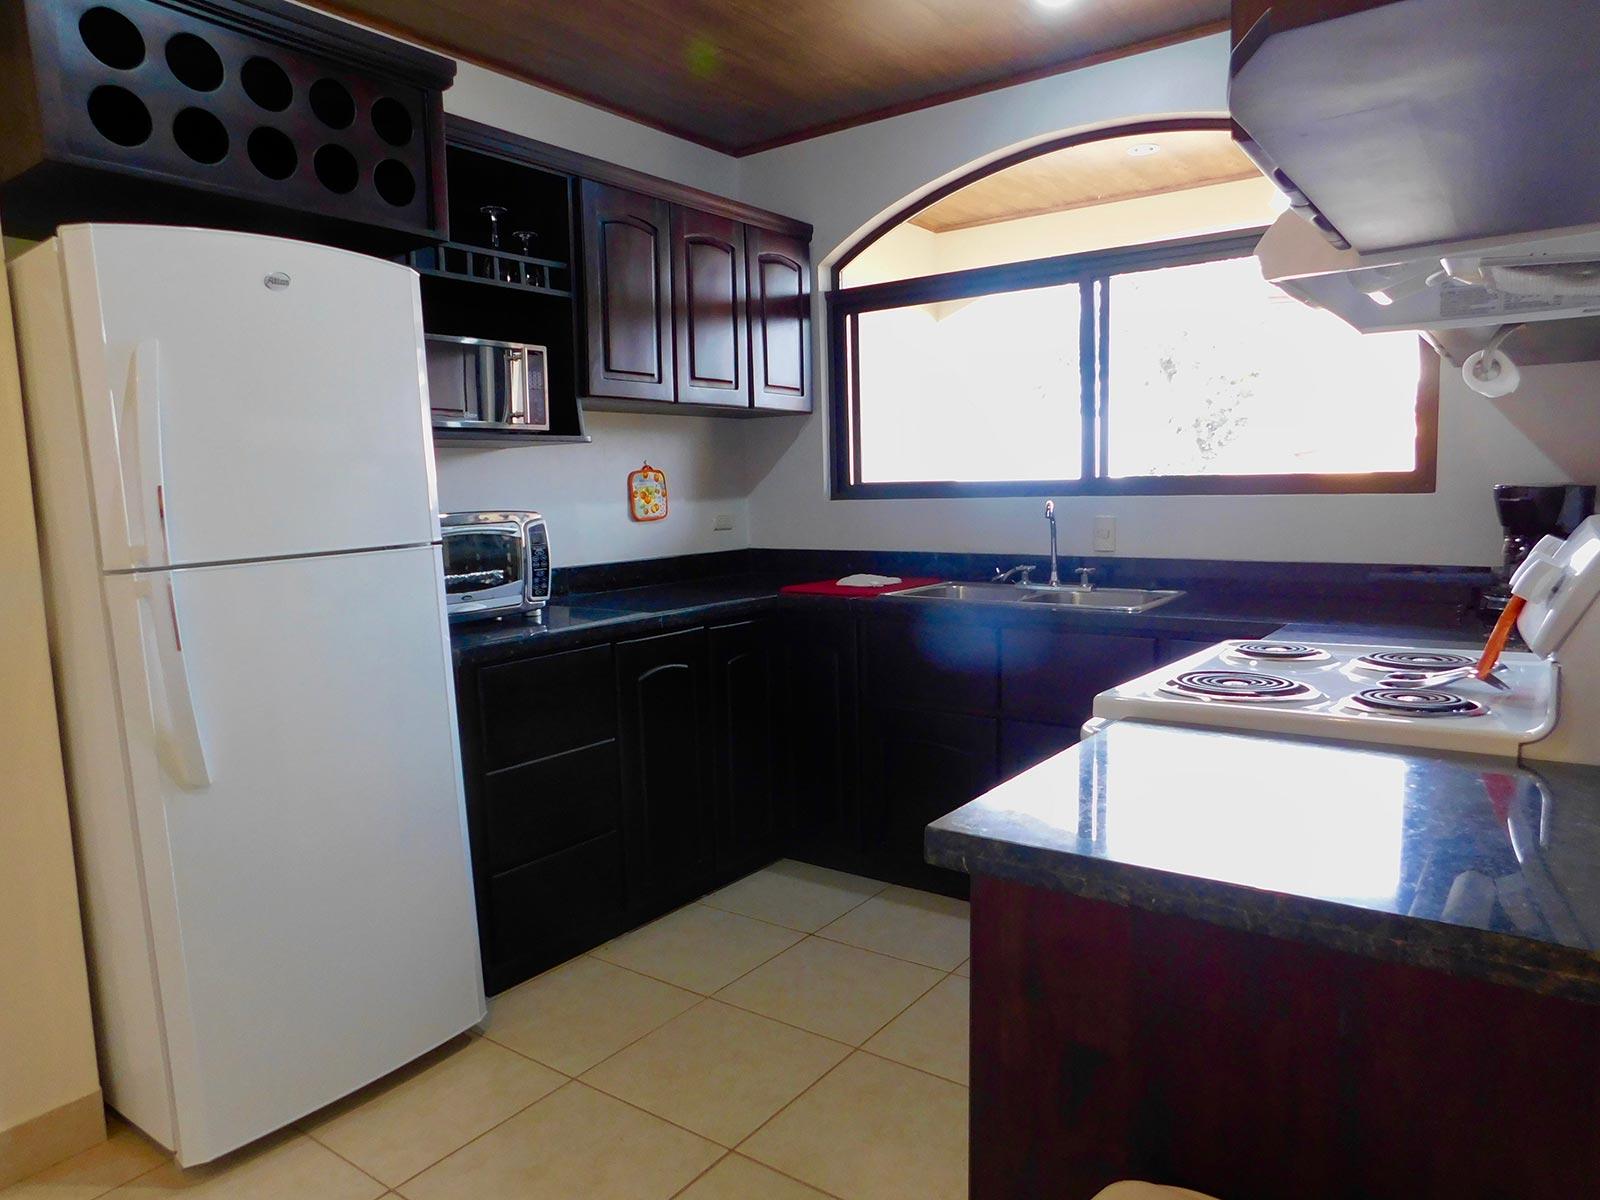 2/1.5 house for sale san ramon costa rica